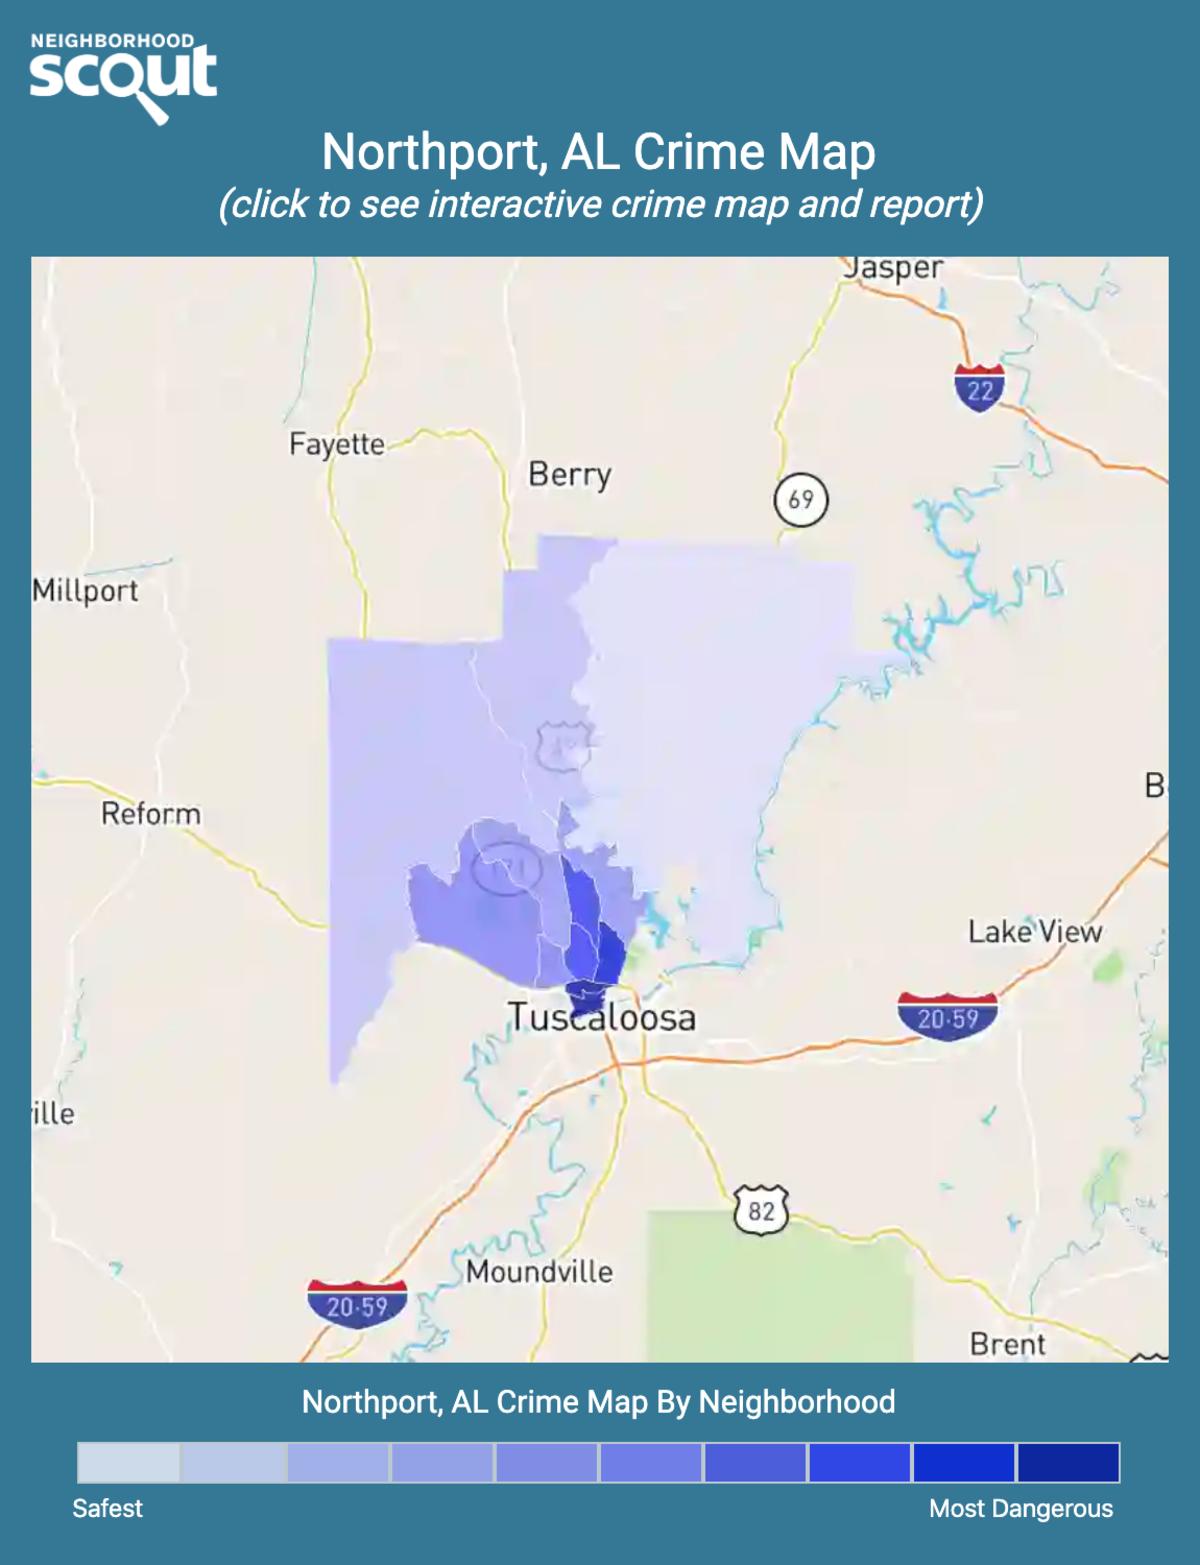 Northport, Alabama crime map